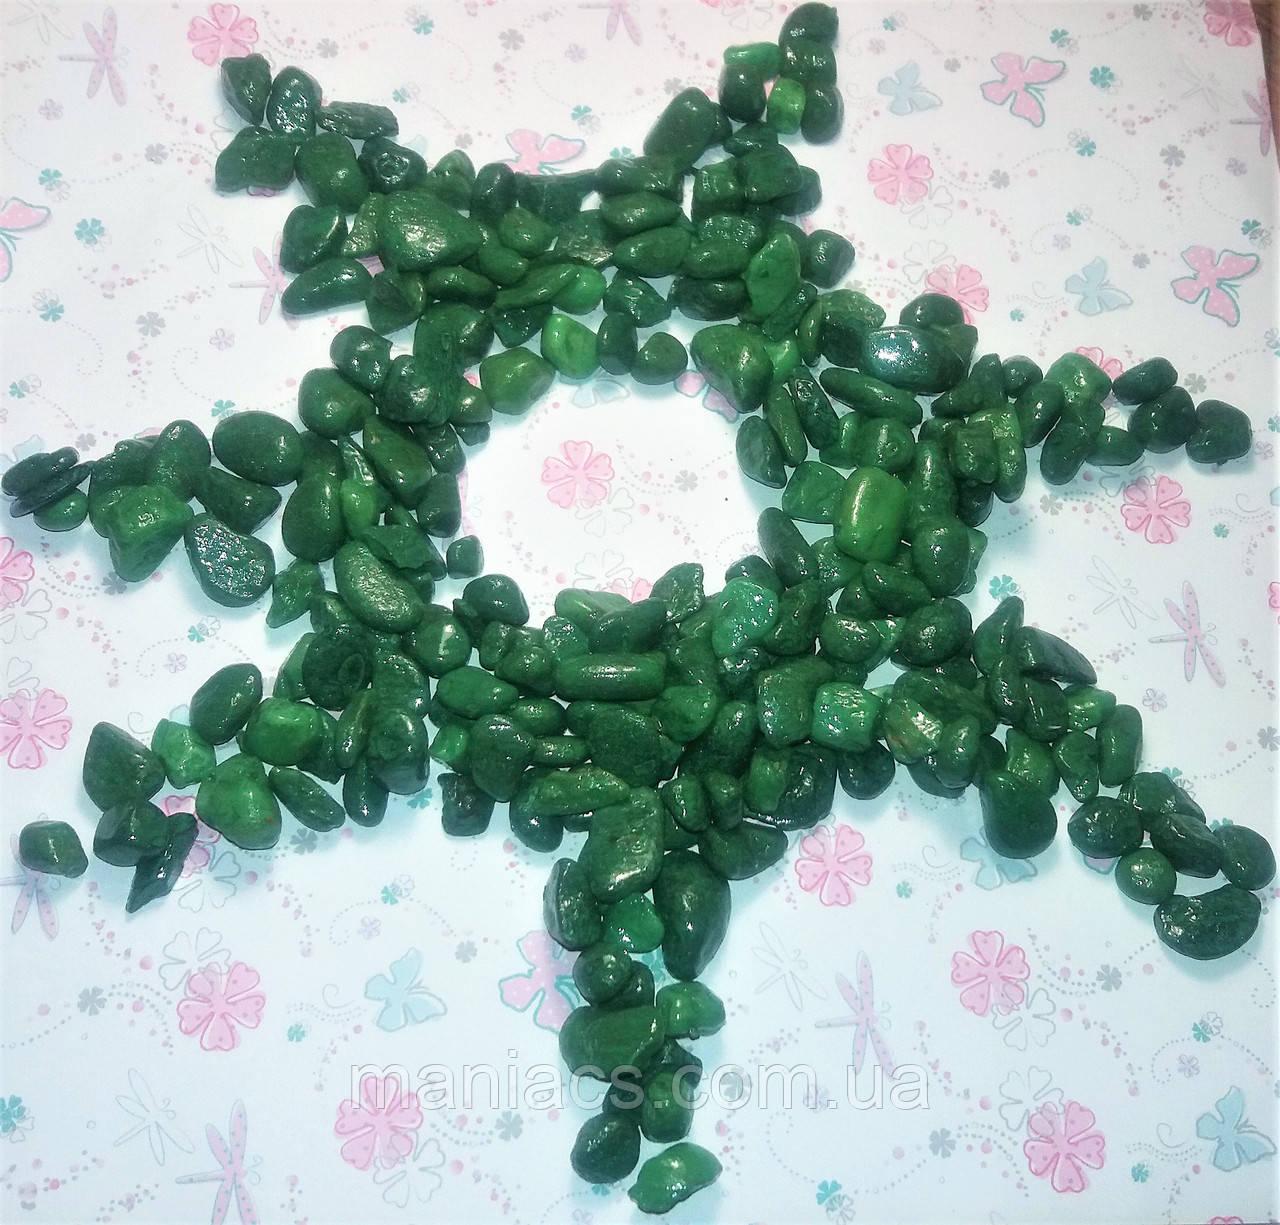 Гравий, Зелёный